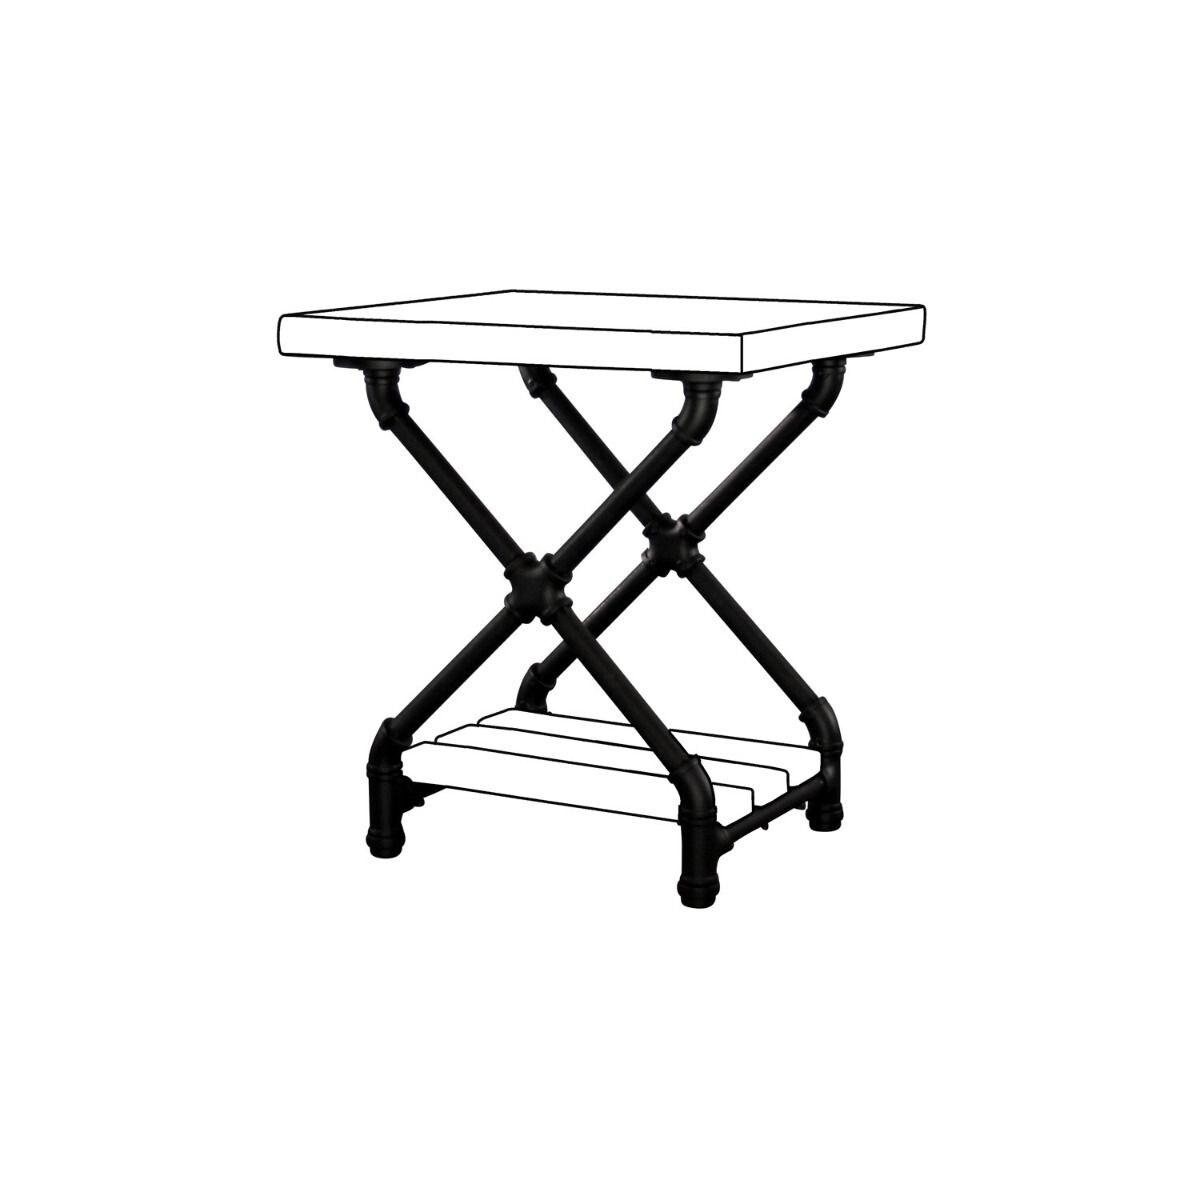 Houston Diy Industrial Side Table Frame Pipe Furniture Kit